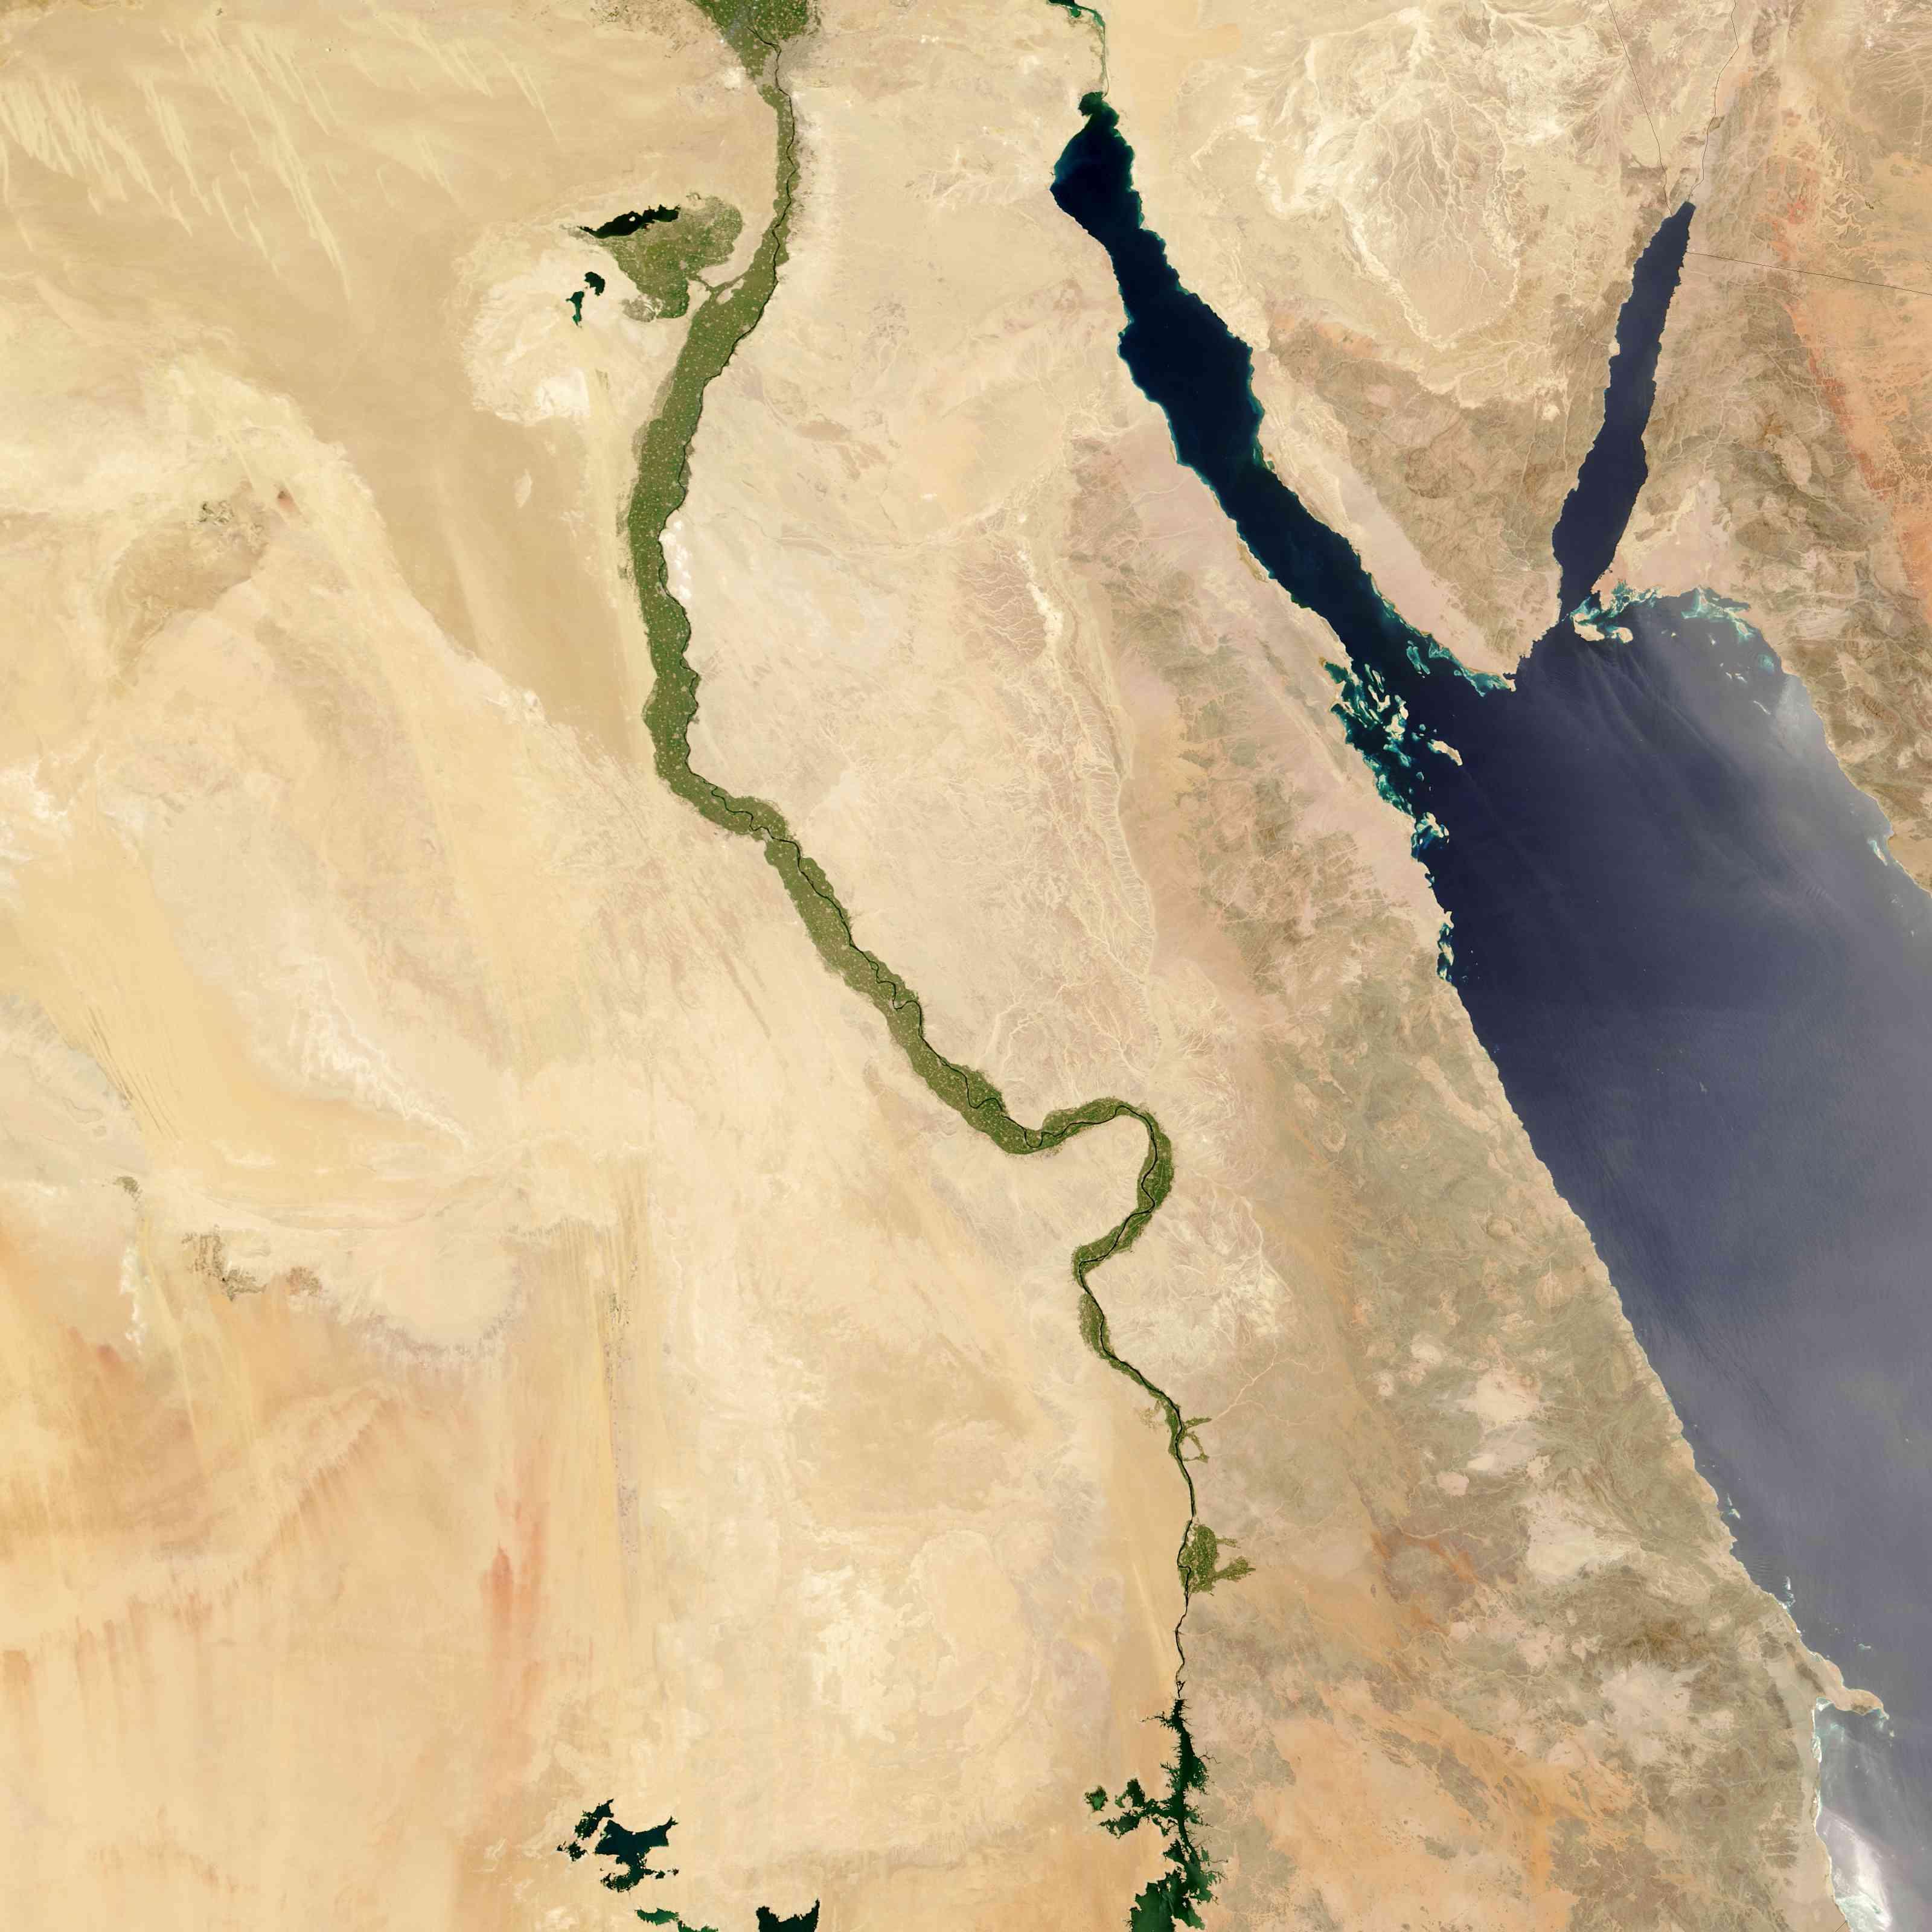 Nile River satellite image